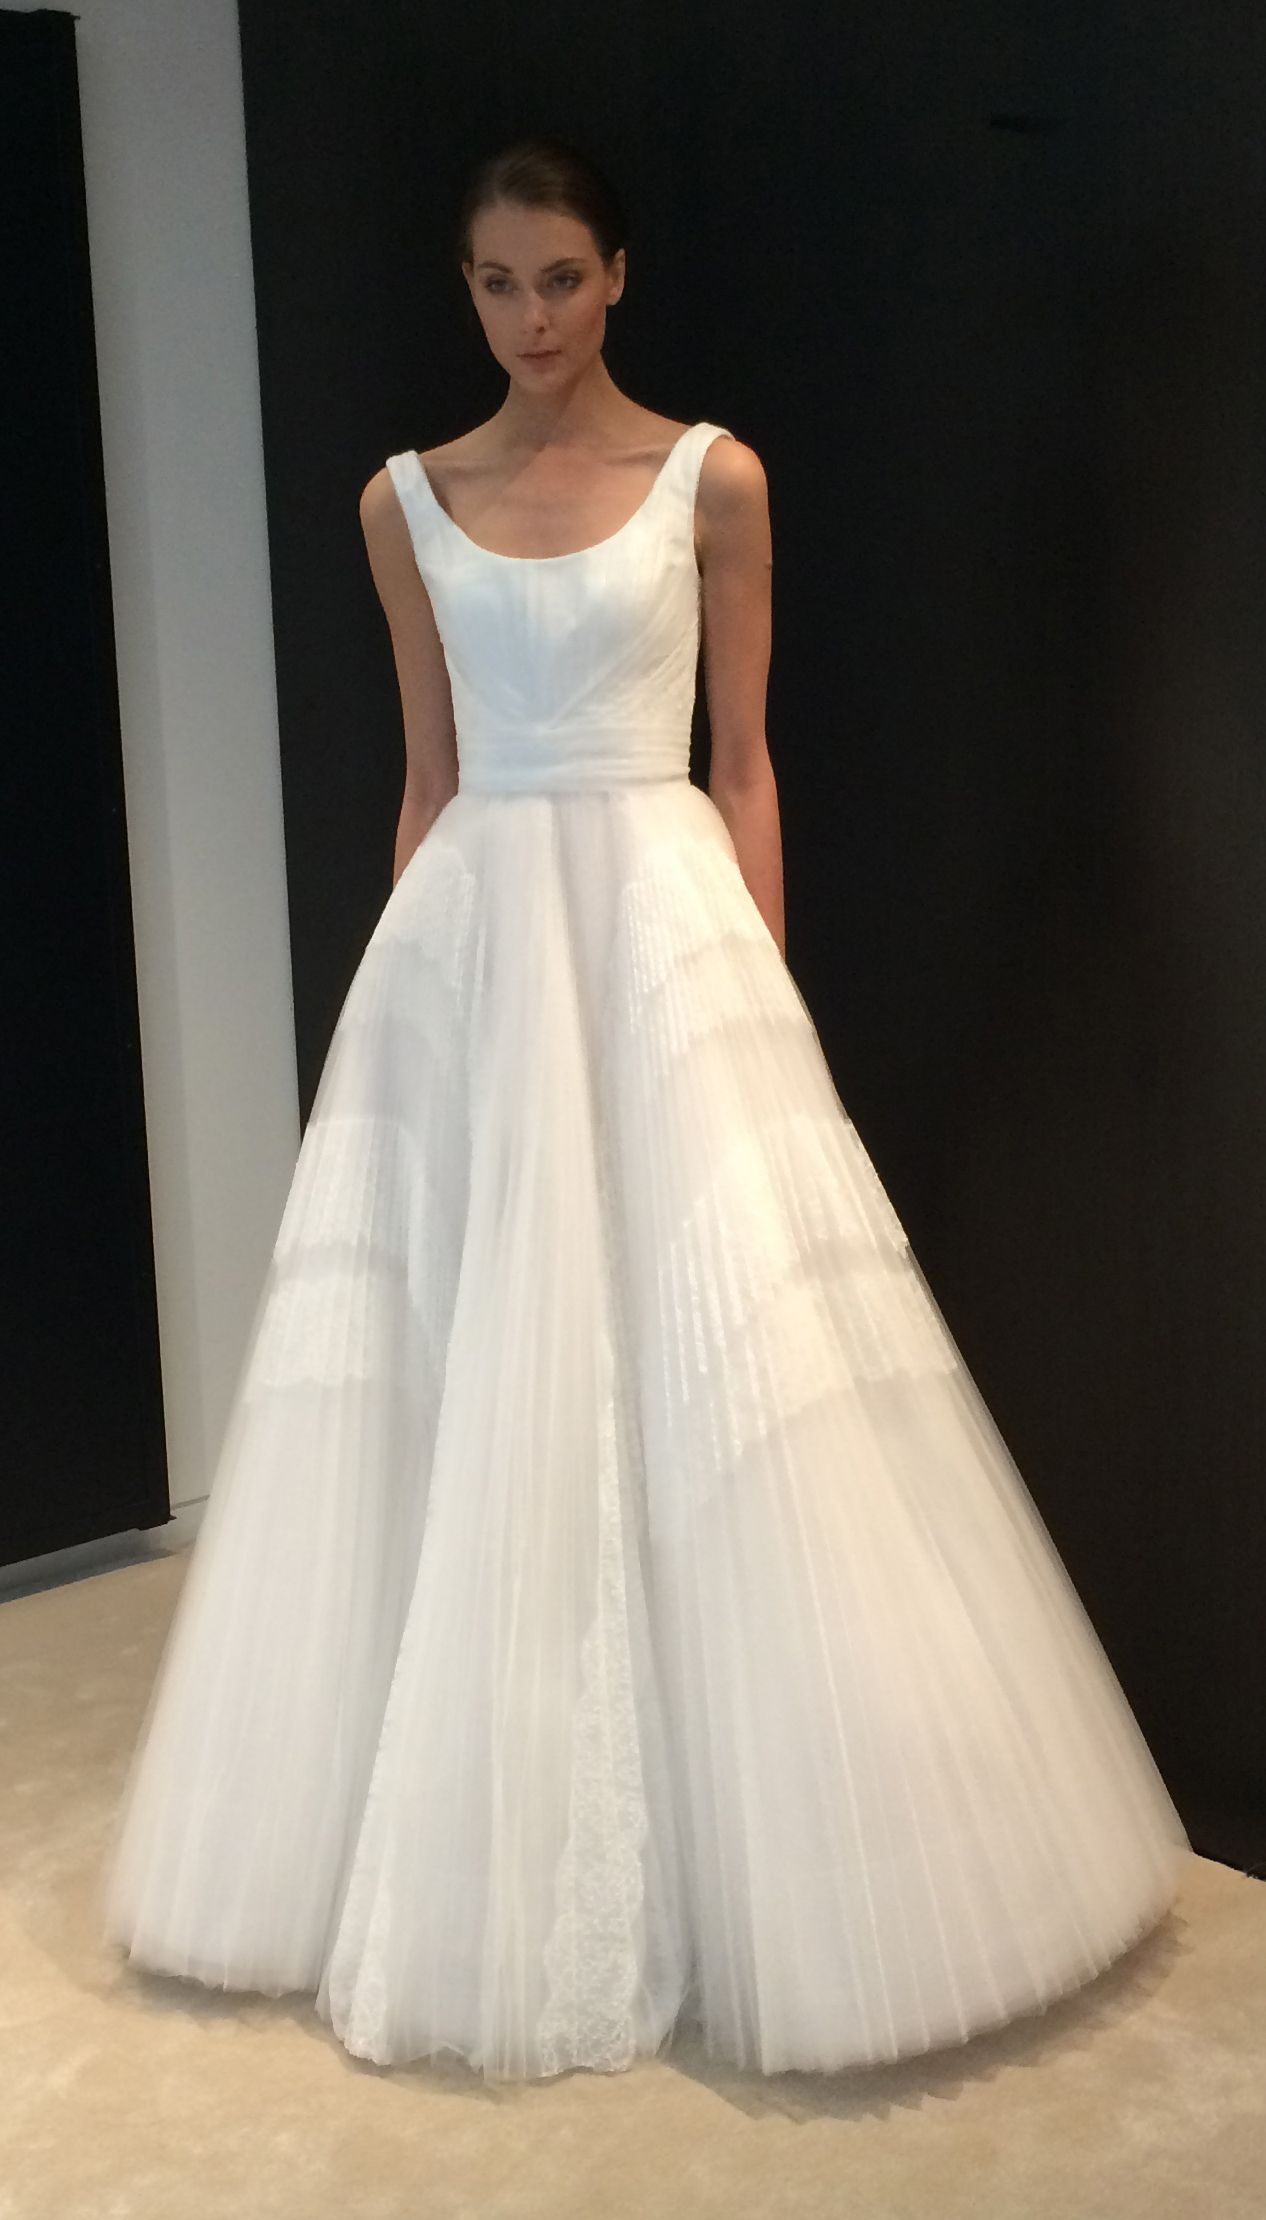 A sneak peek at  jmendel s new bridal collection  6b819966f56